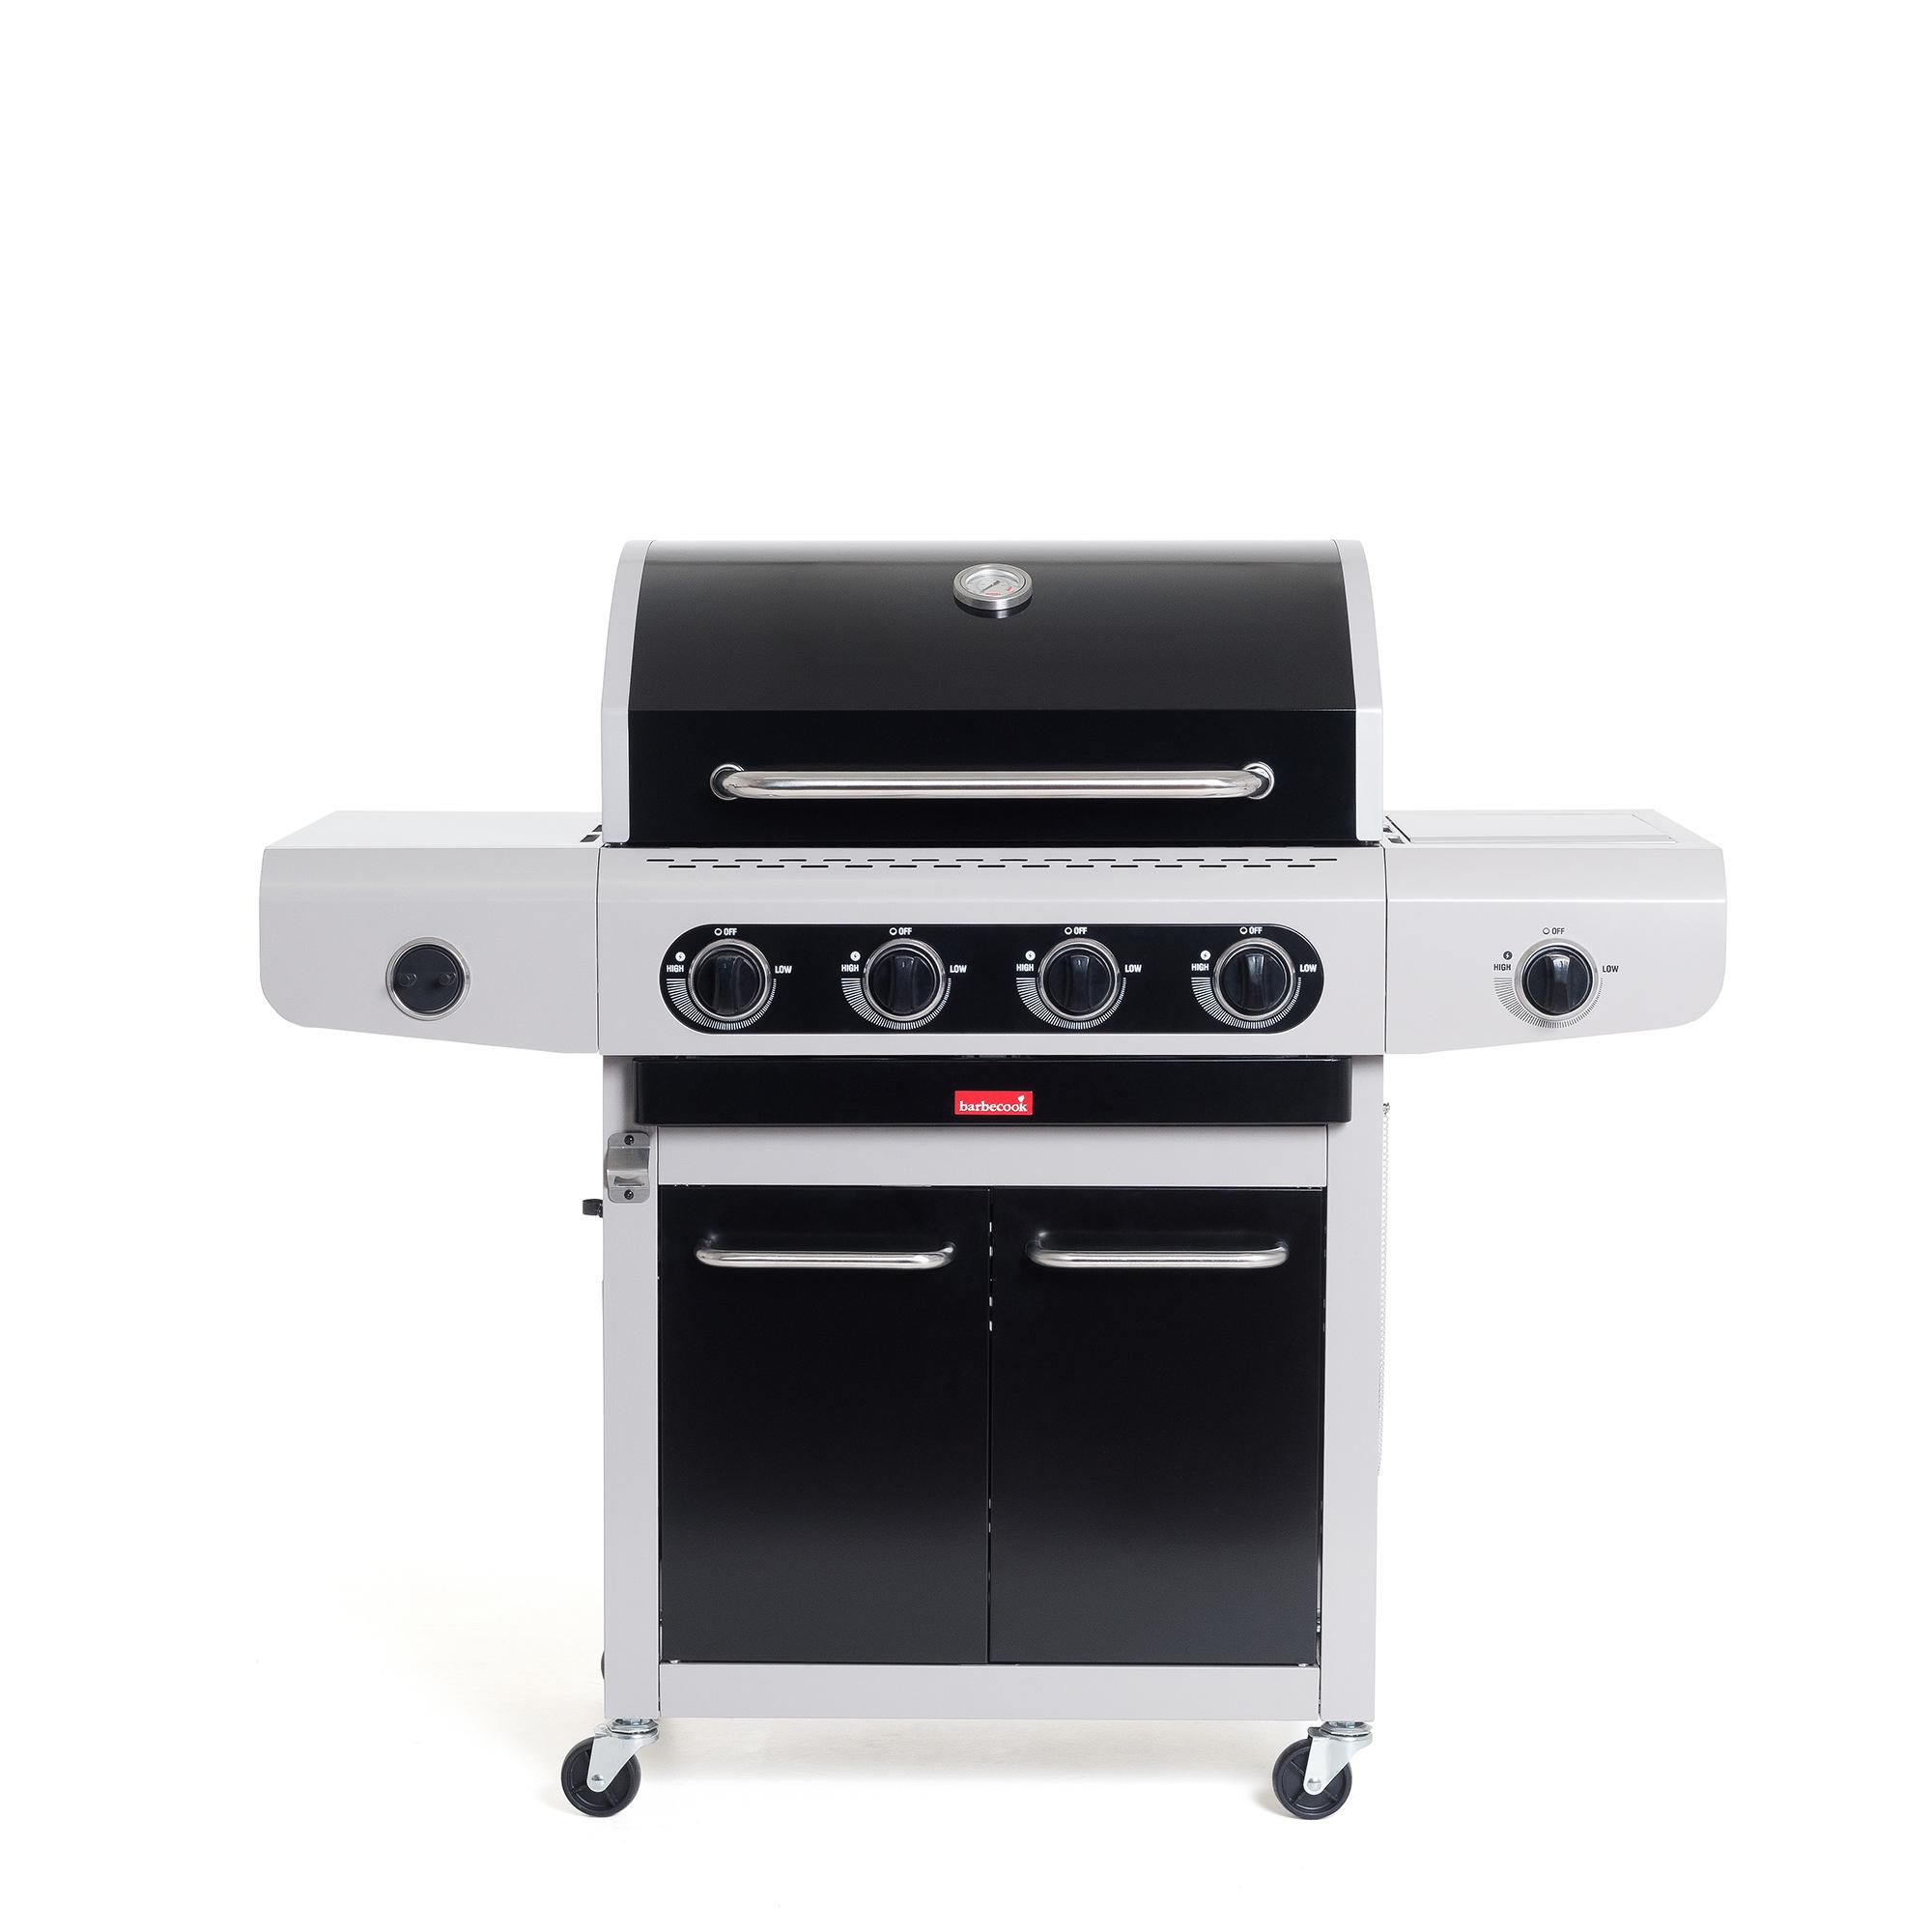 Barbecook Siesta 412 Black Edition gas barbecue 13